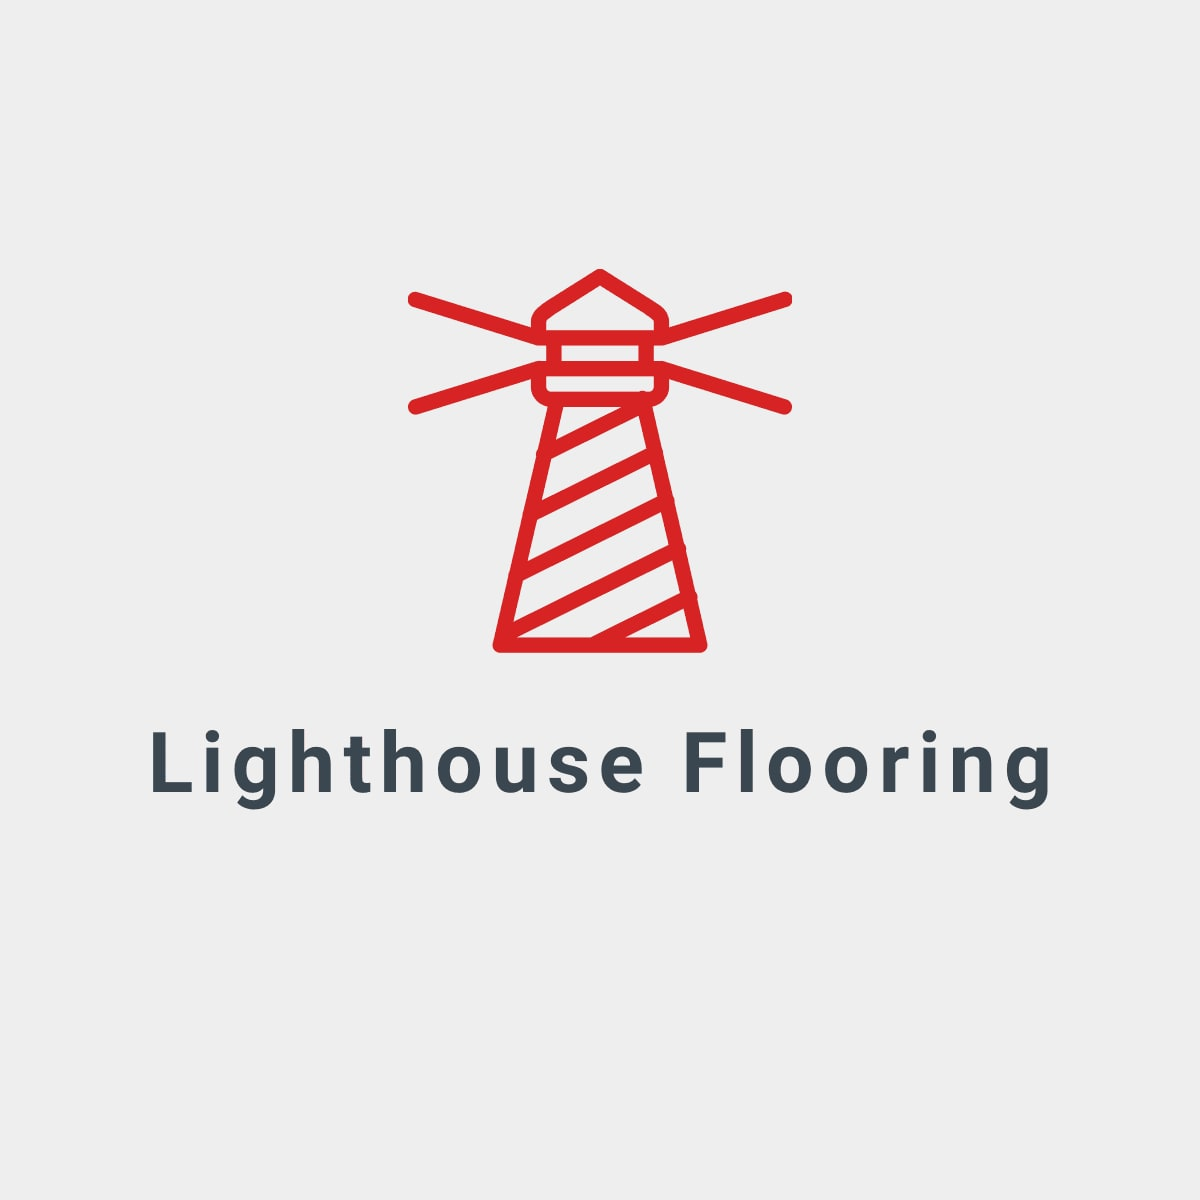 Lighthouse Flooring, LLC